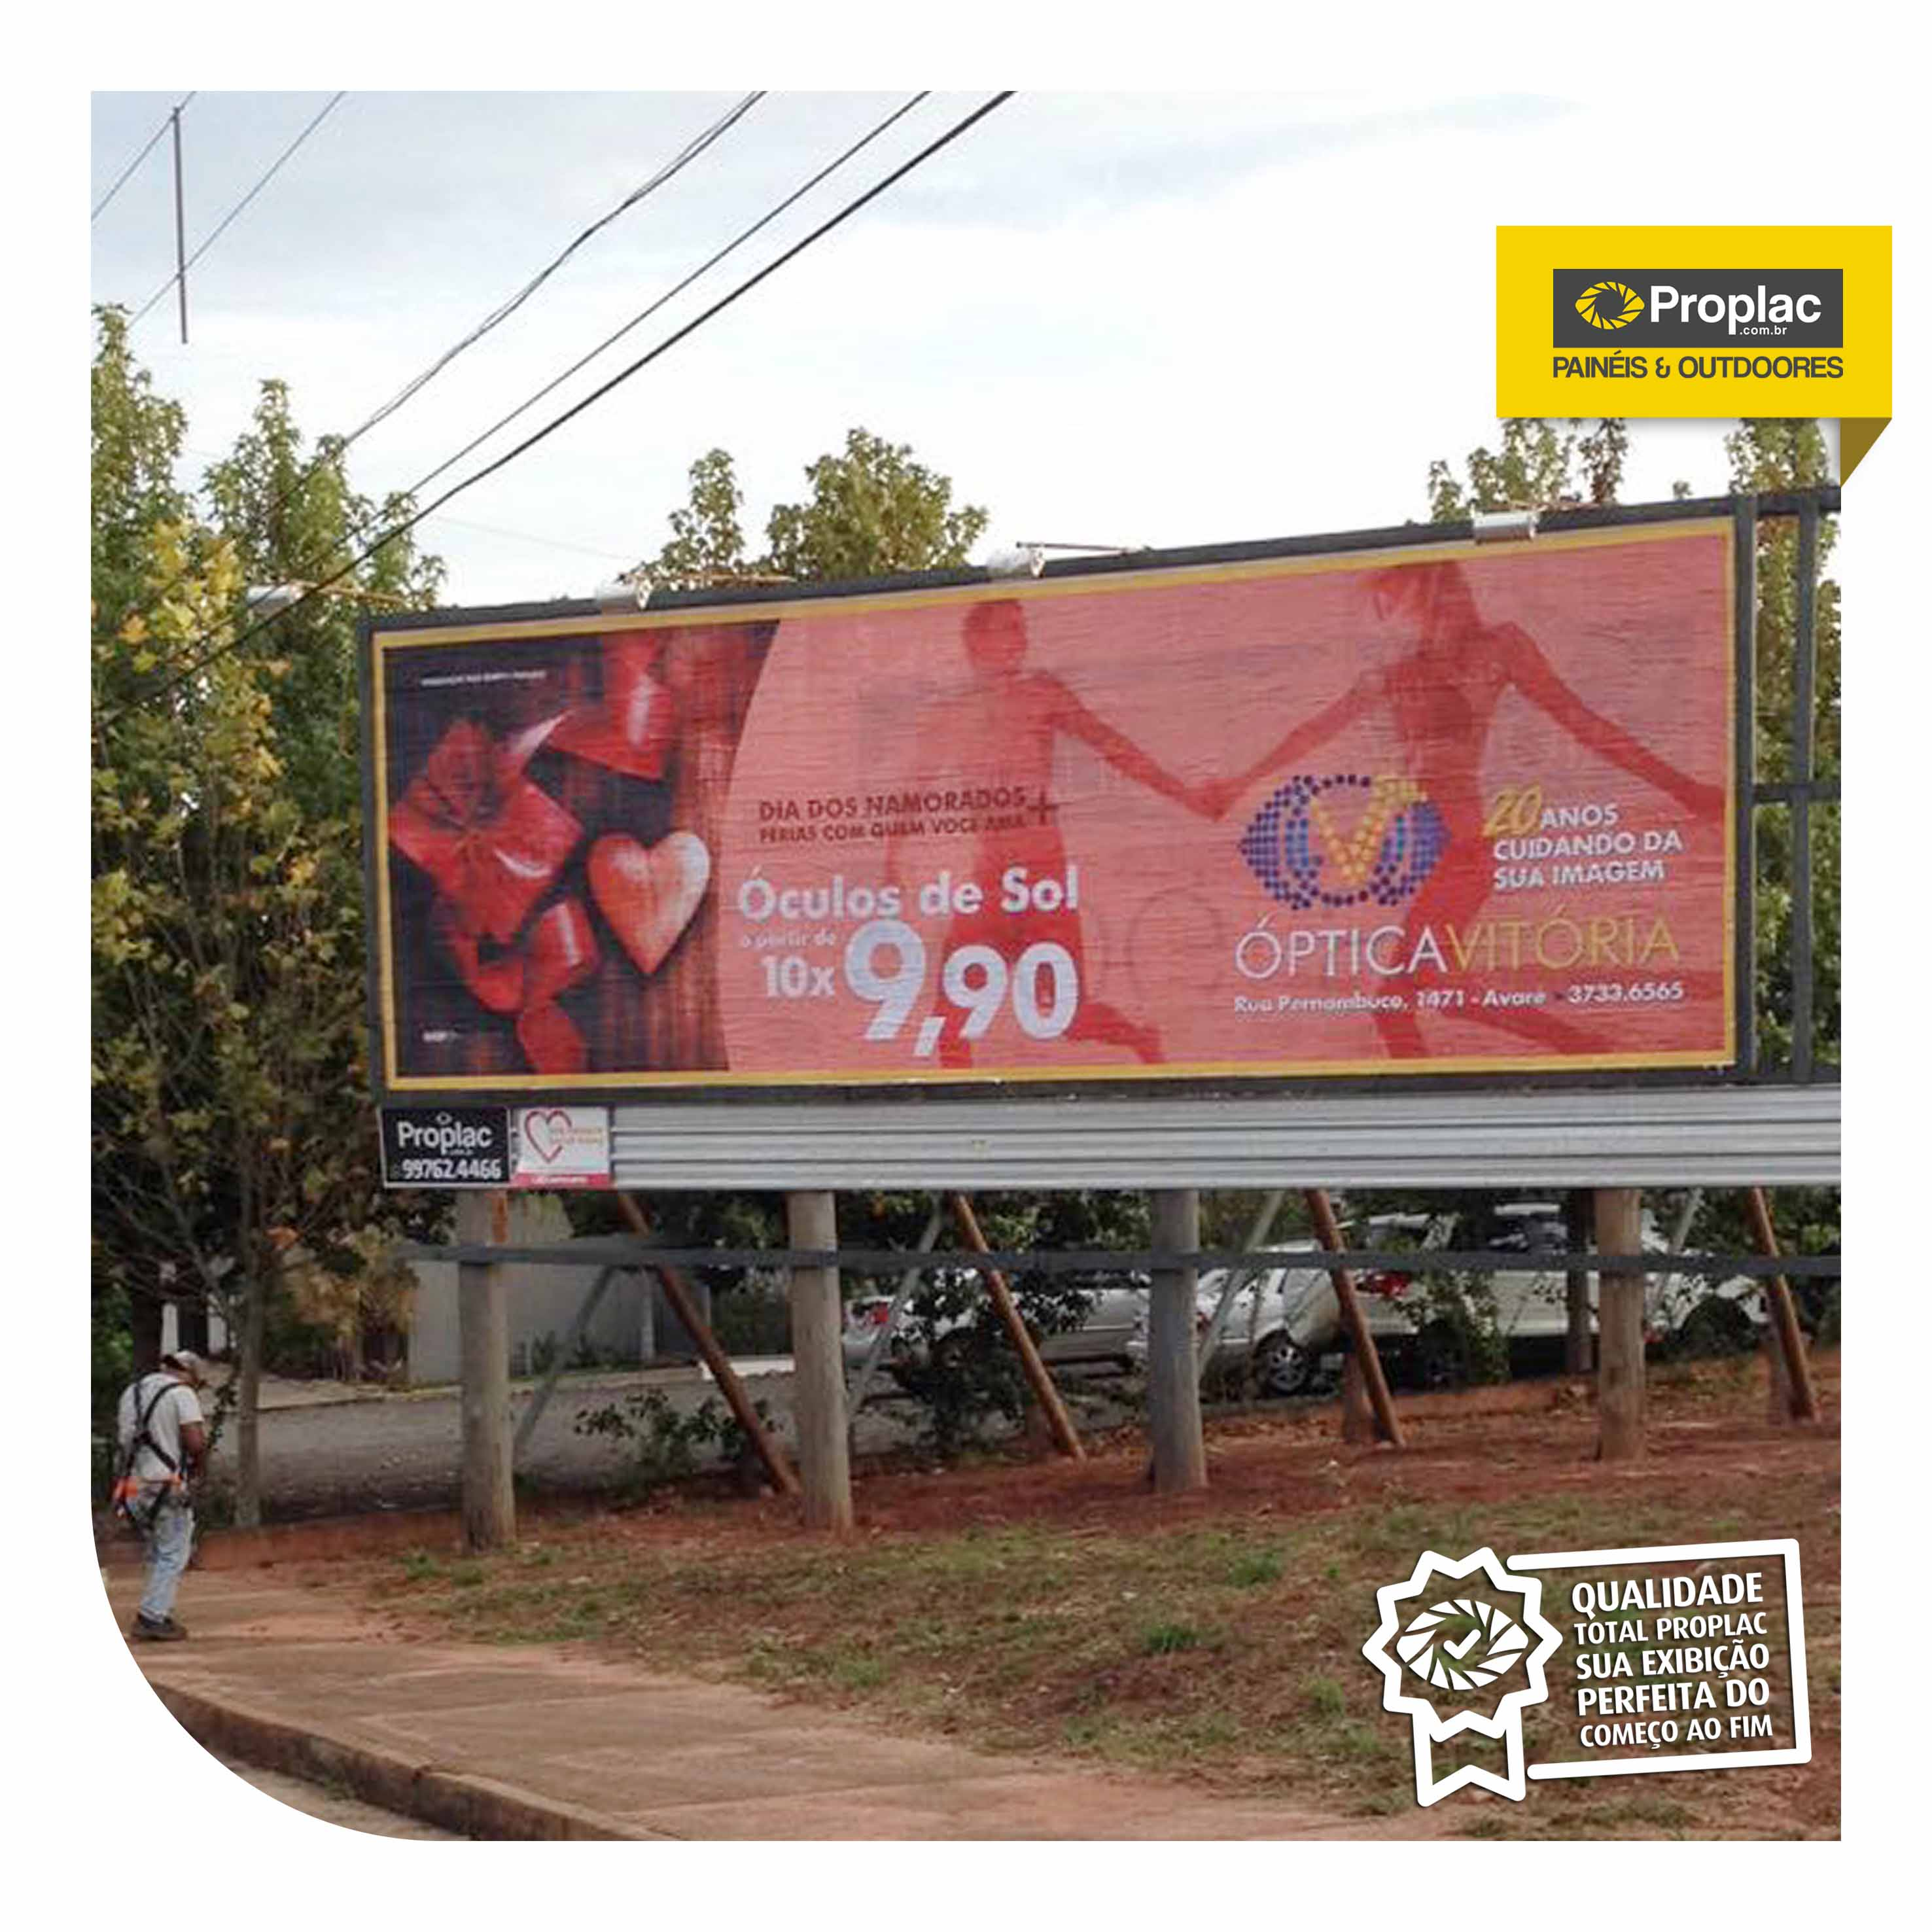 7916b17b67c95 ONDE FICA Óptica Vitória Rua Pernambuco, 1471 – Centro Avaré – SP- Brasil  Tel (14) 3733.6565 www.facebook.com optica-vitoria